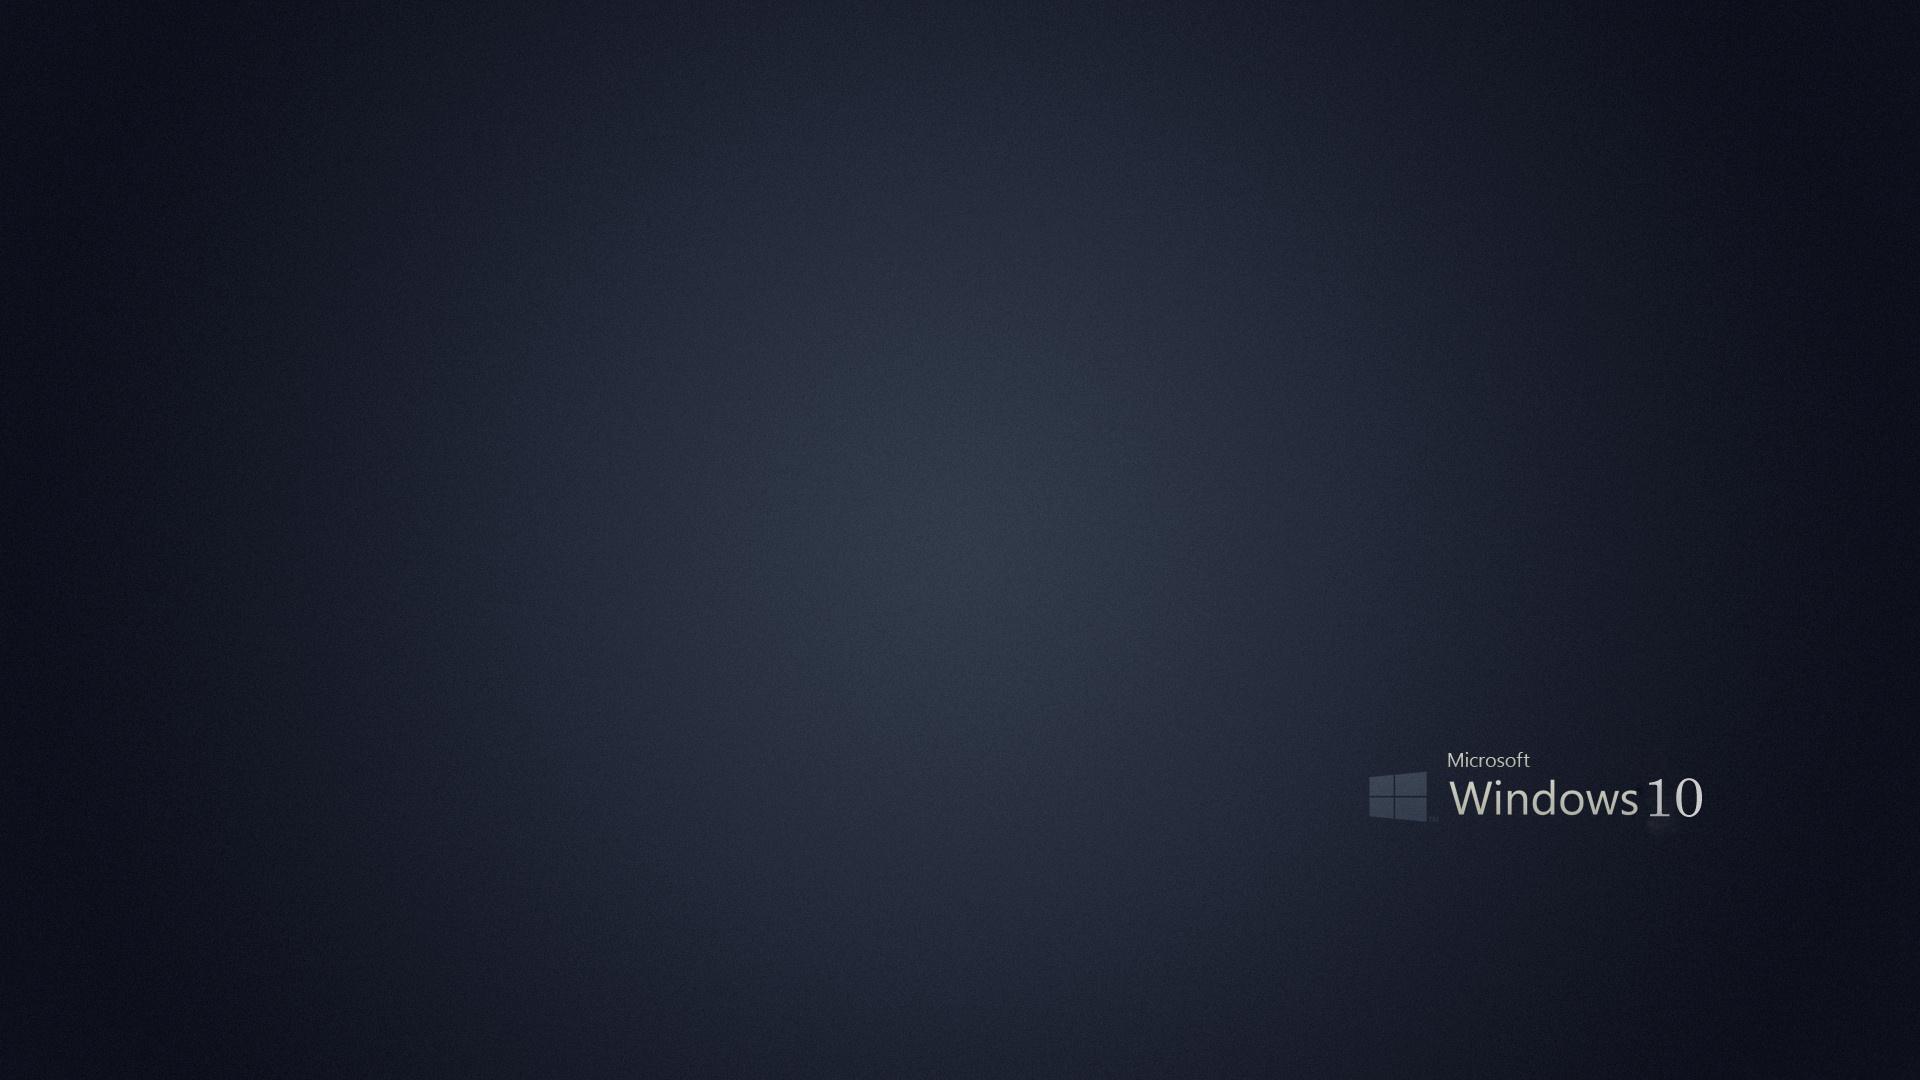 Windows 10 1920—1080 Wallpaper